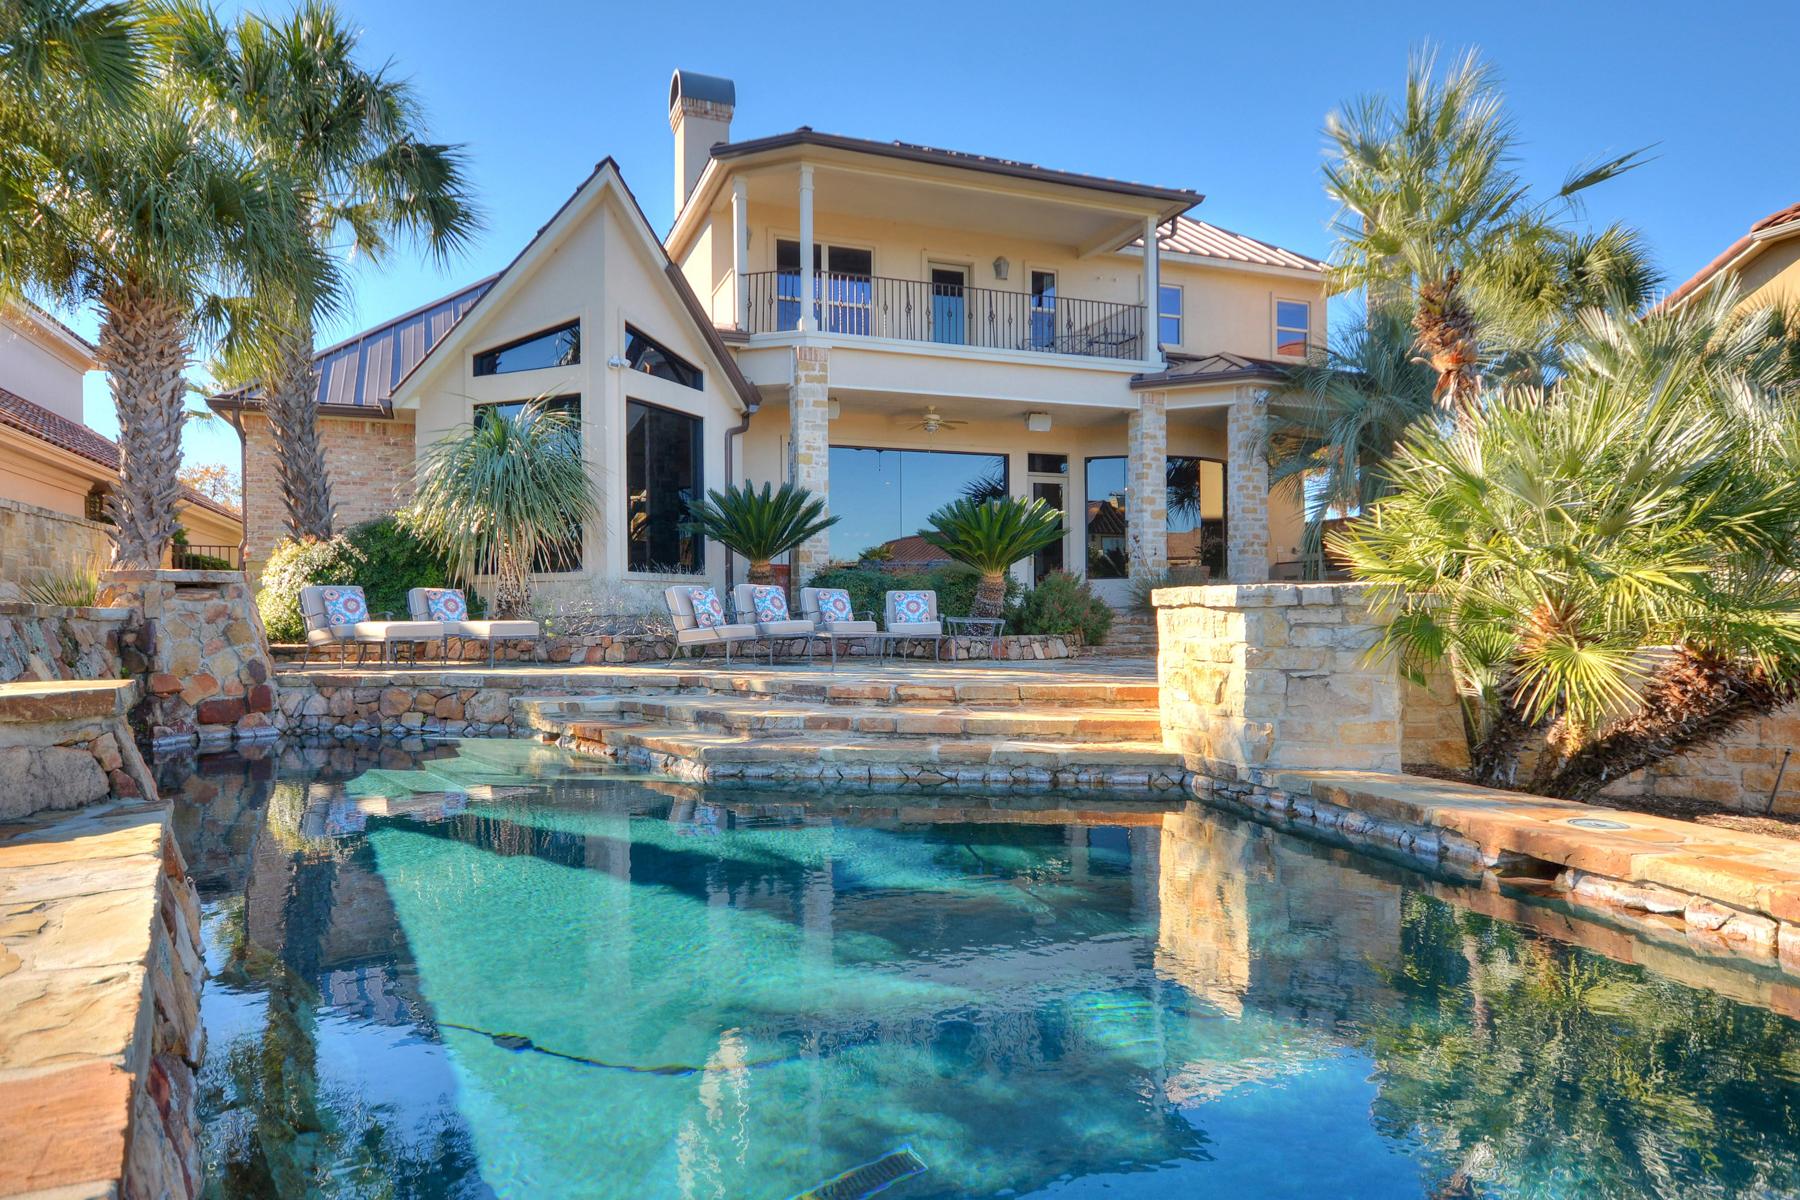 Single Family Home for Sale at Absolute Paradise on Lake LBJ 73 Applehead Island Horseshoe Bay, Texas 78657 United States